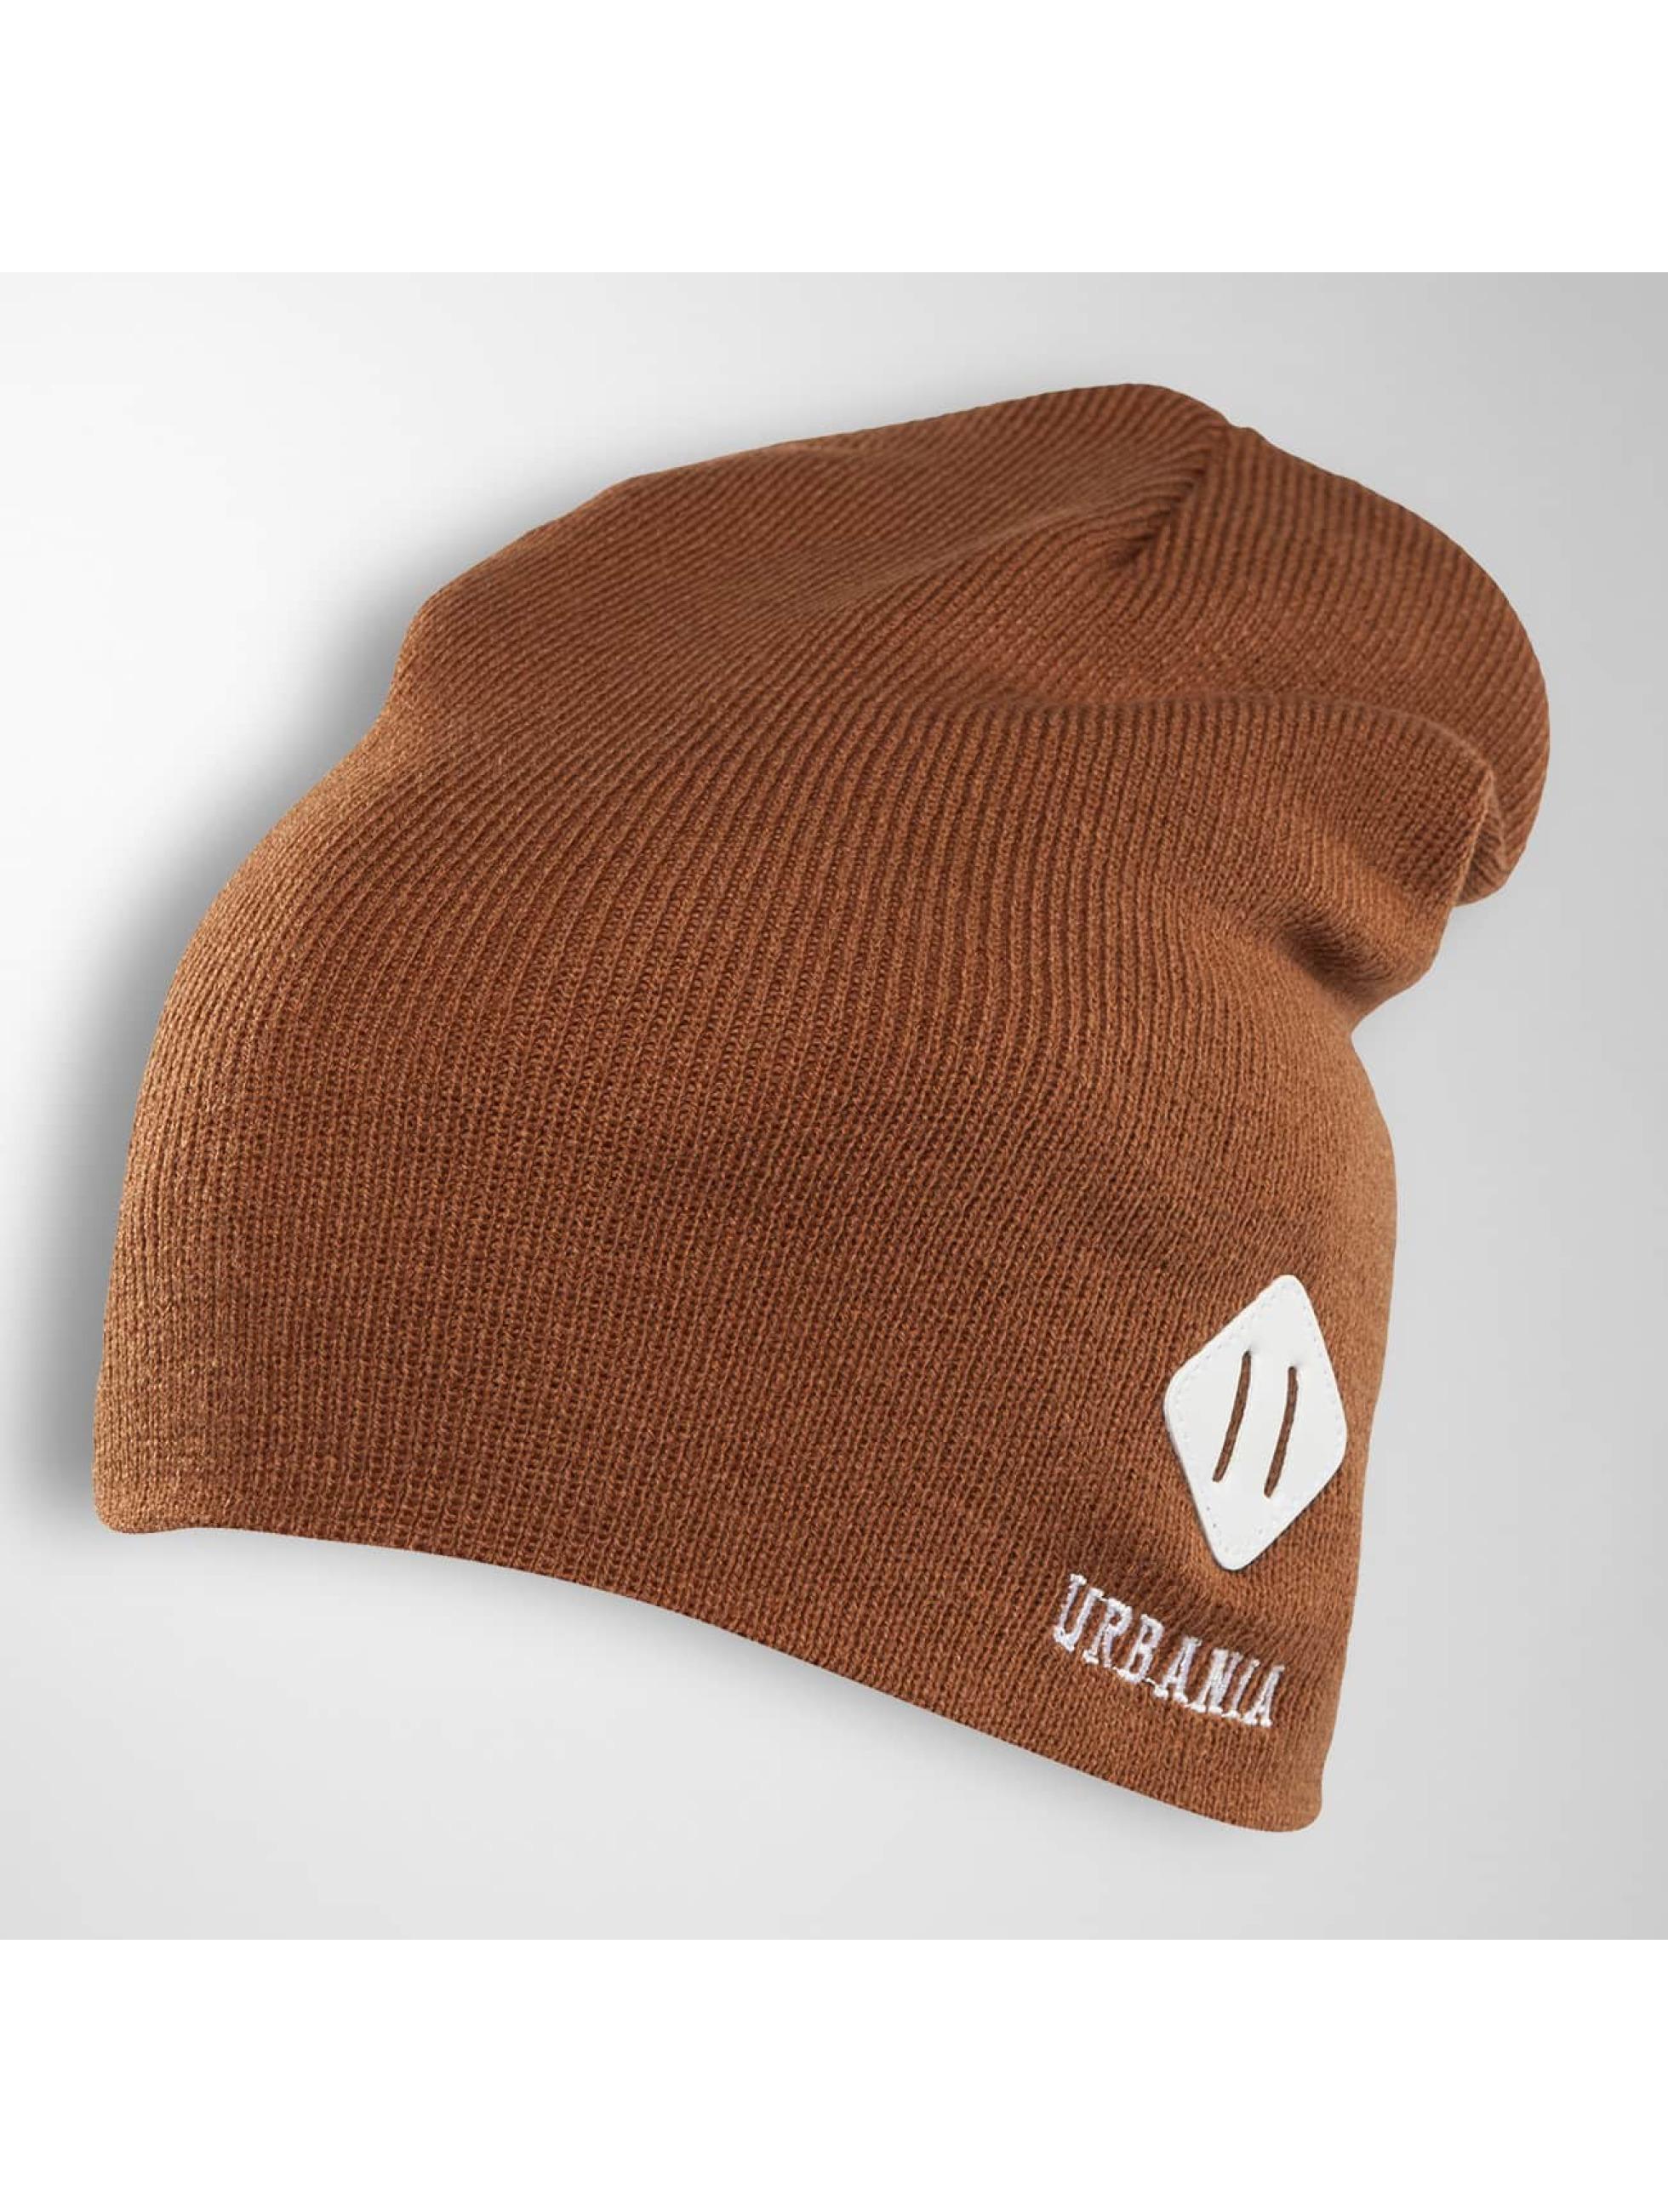 TrueSpin шляпа Solo HK бежевый